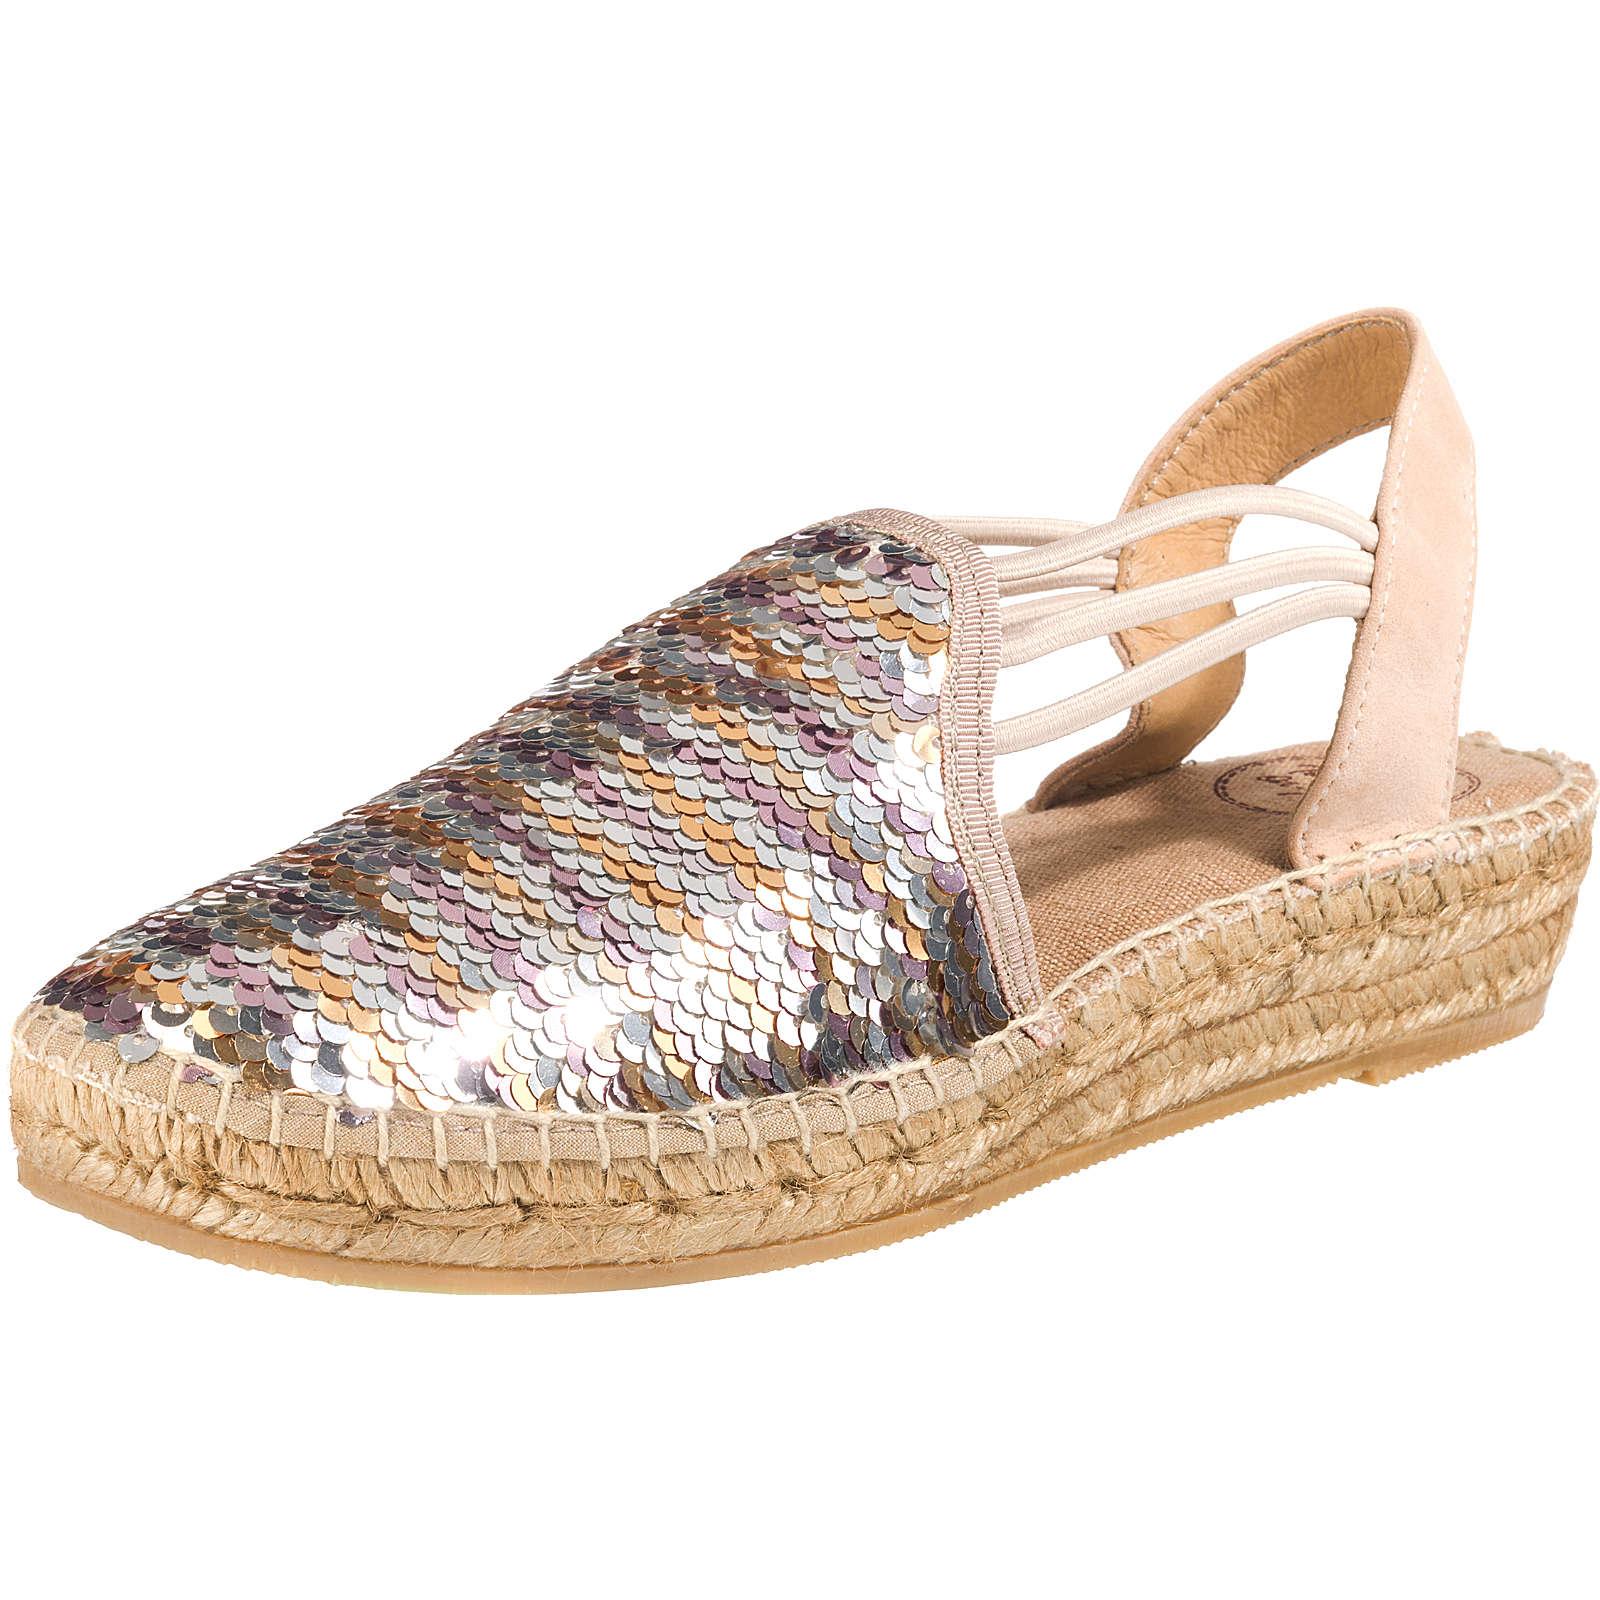 Toni Pons Klassische Sandalen silber Damen Gr. 42